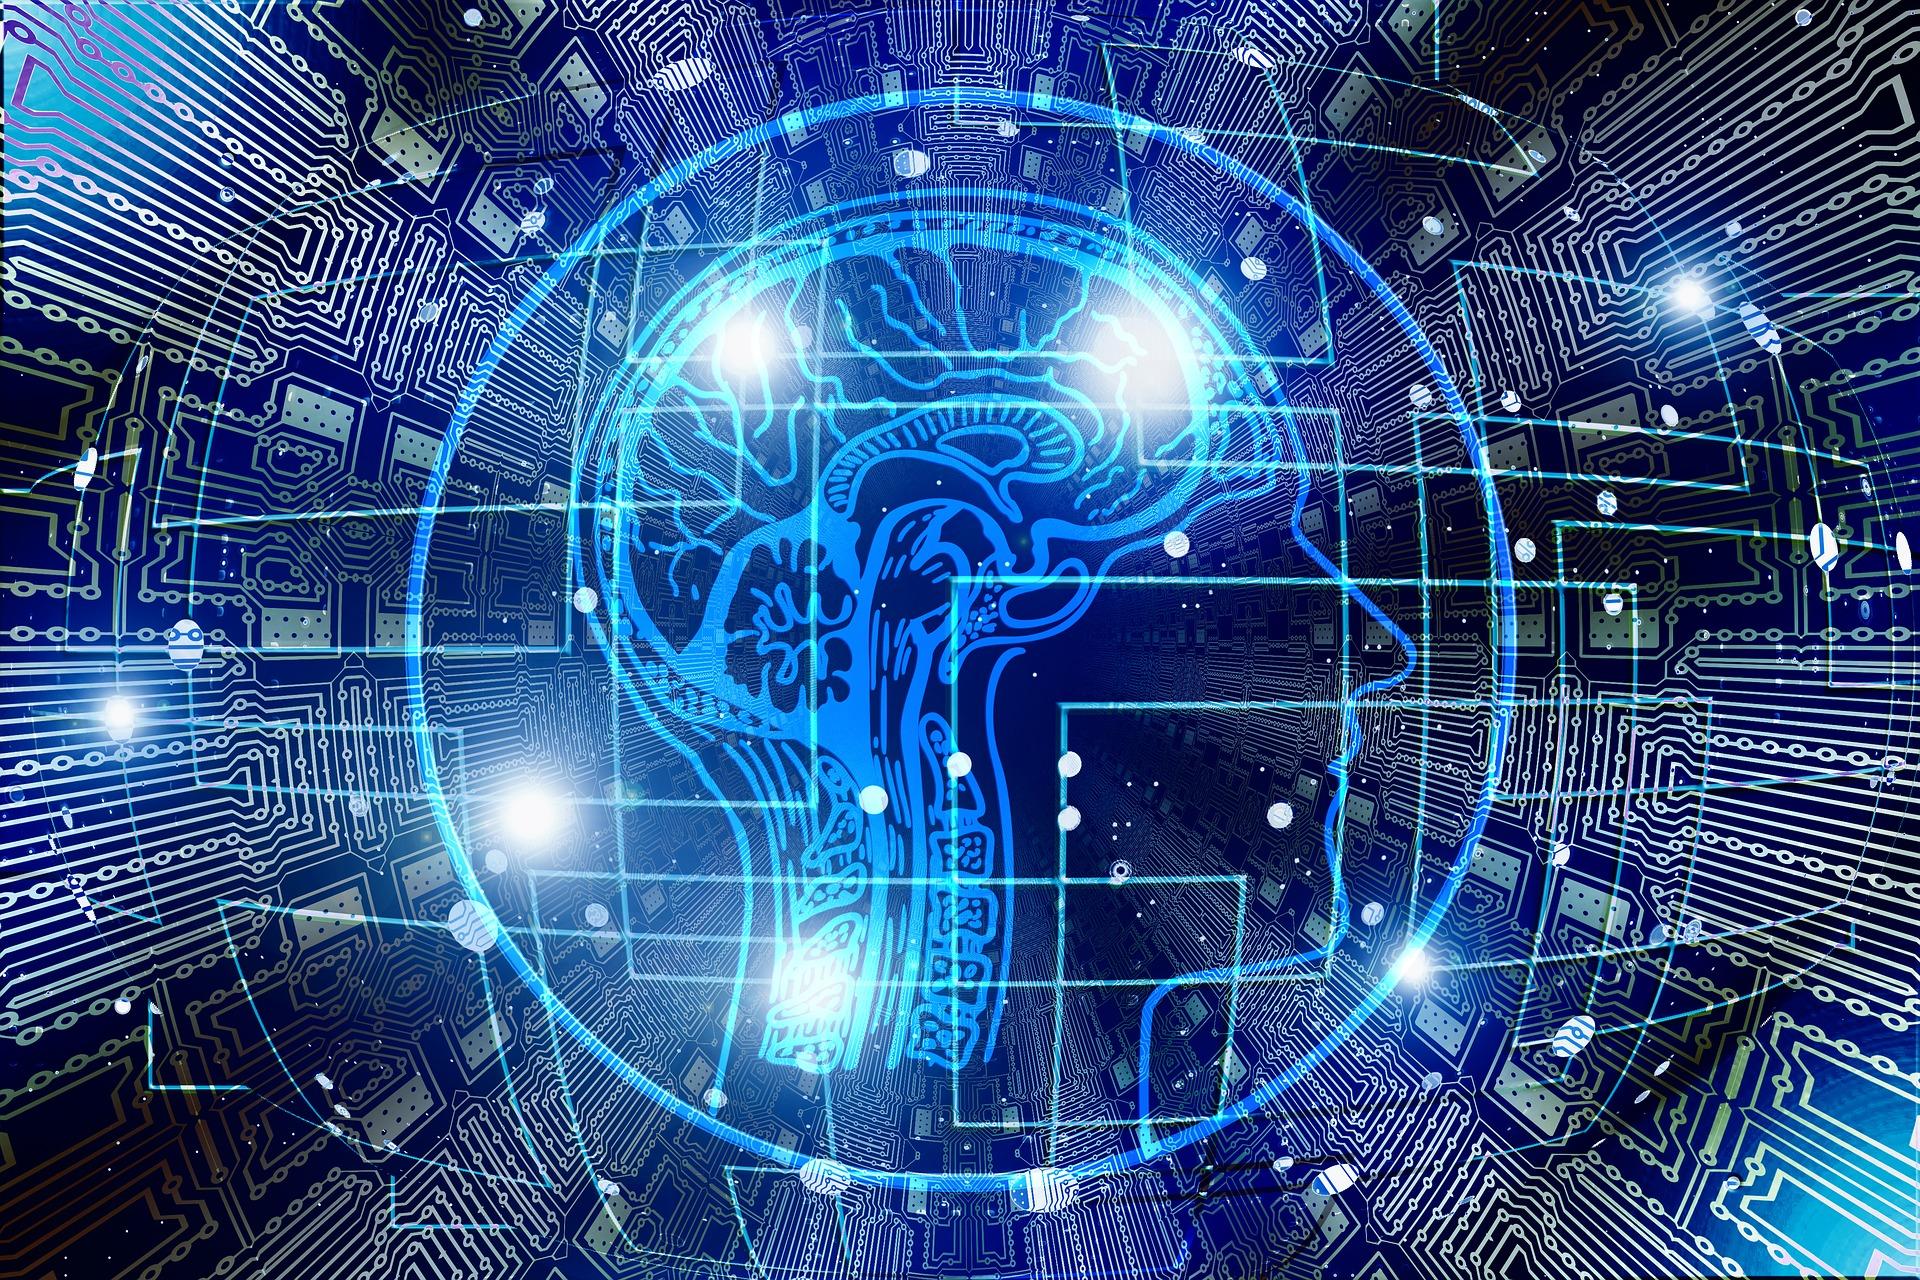 fiercebiotech.com - Verge Genomics gathers $32M to trial its AI-built neuroscience drugs